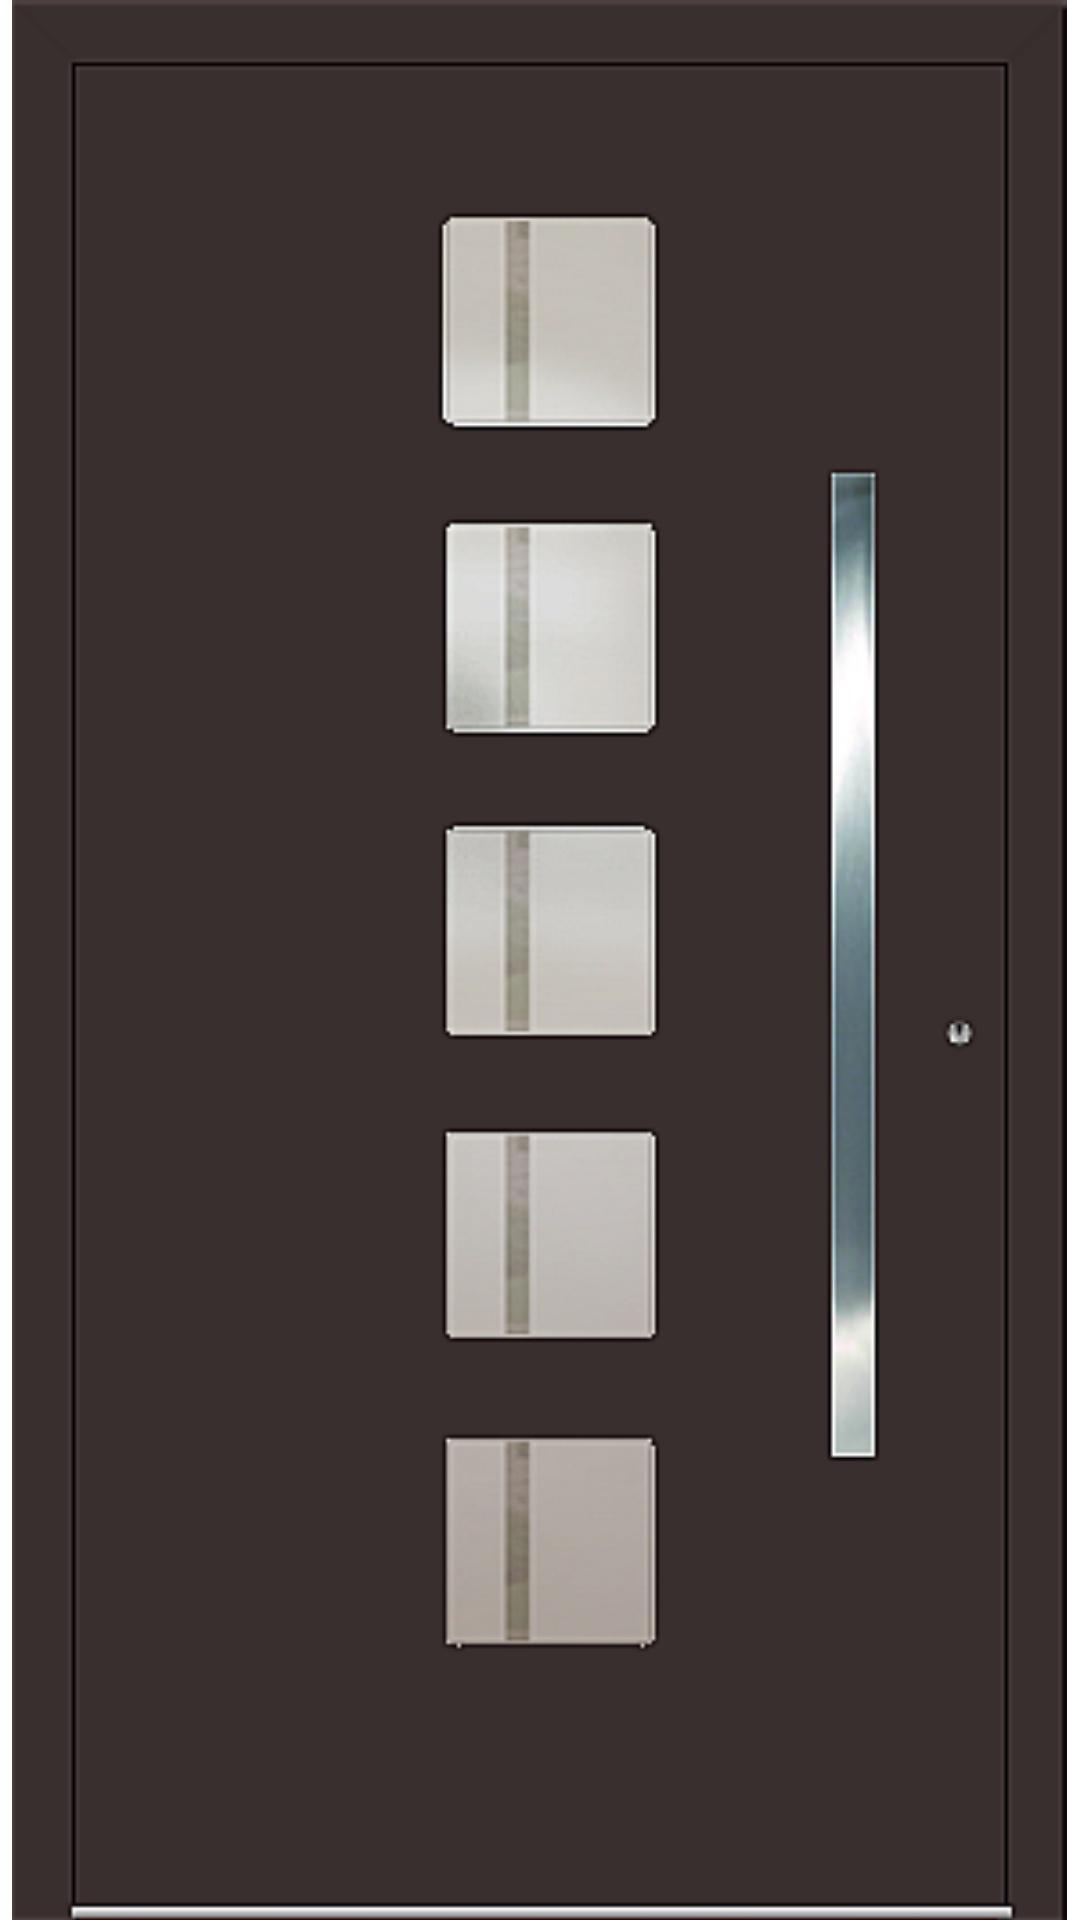 PaXentree Aluminium Haustür M04500 schokoladenbraun